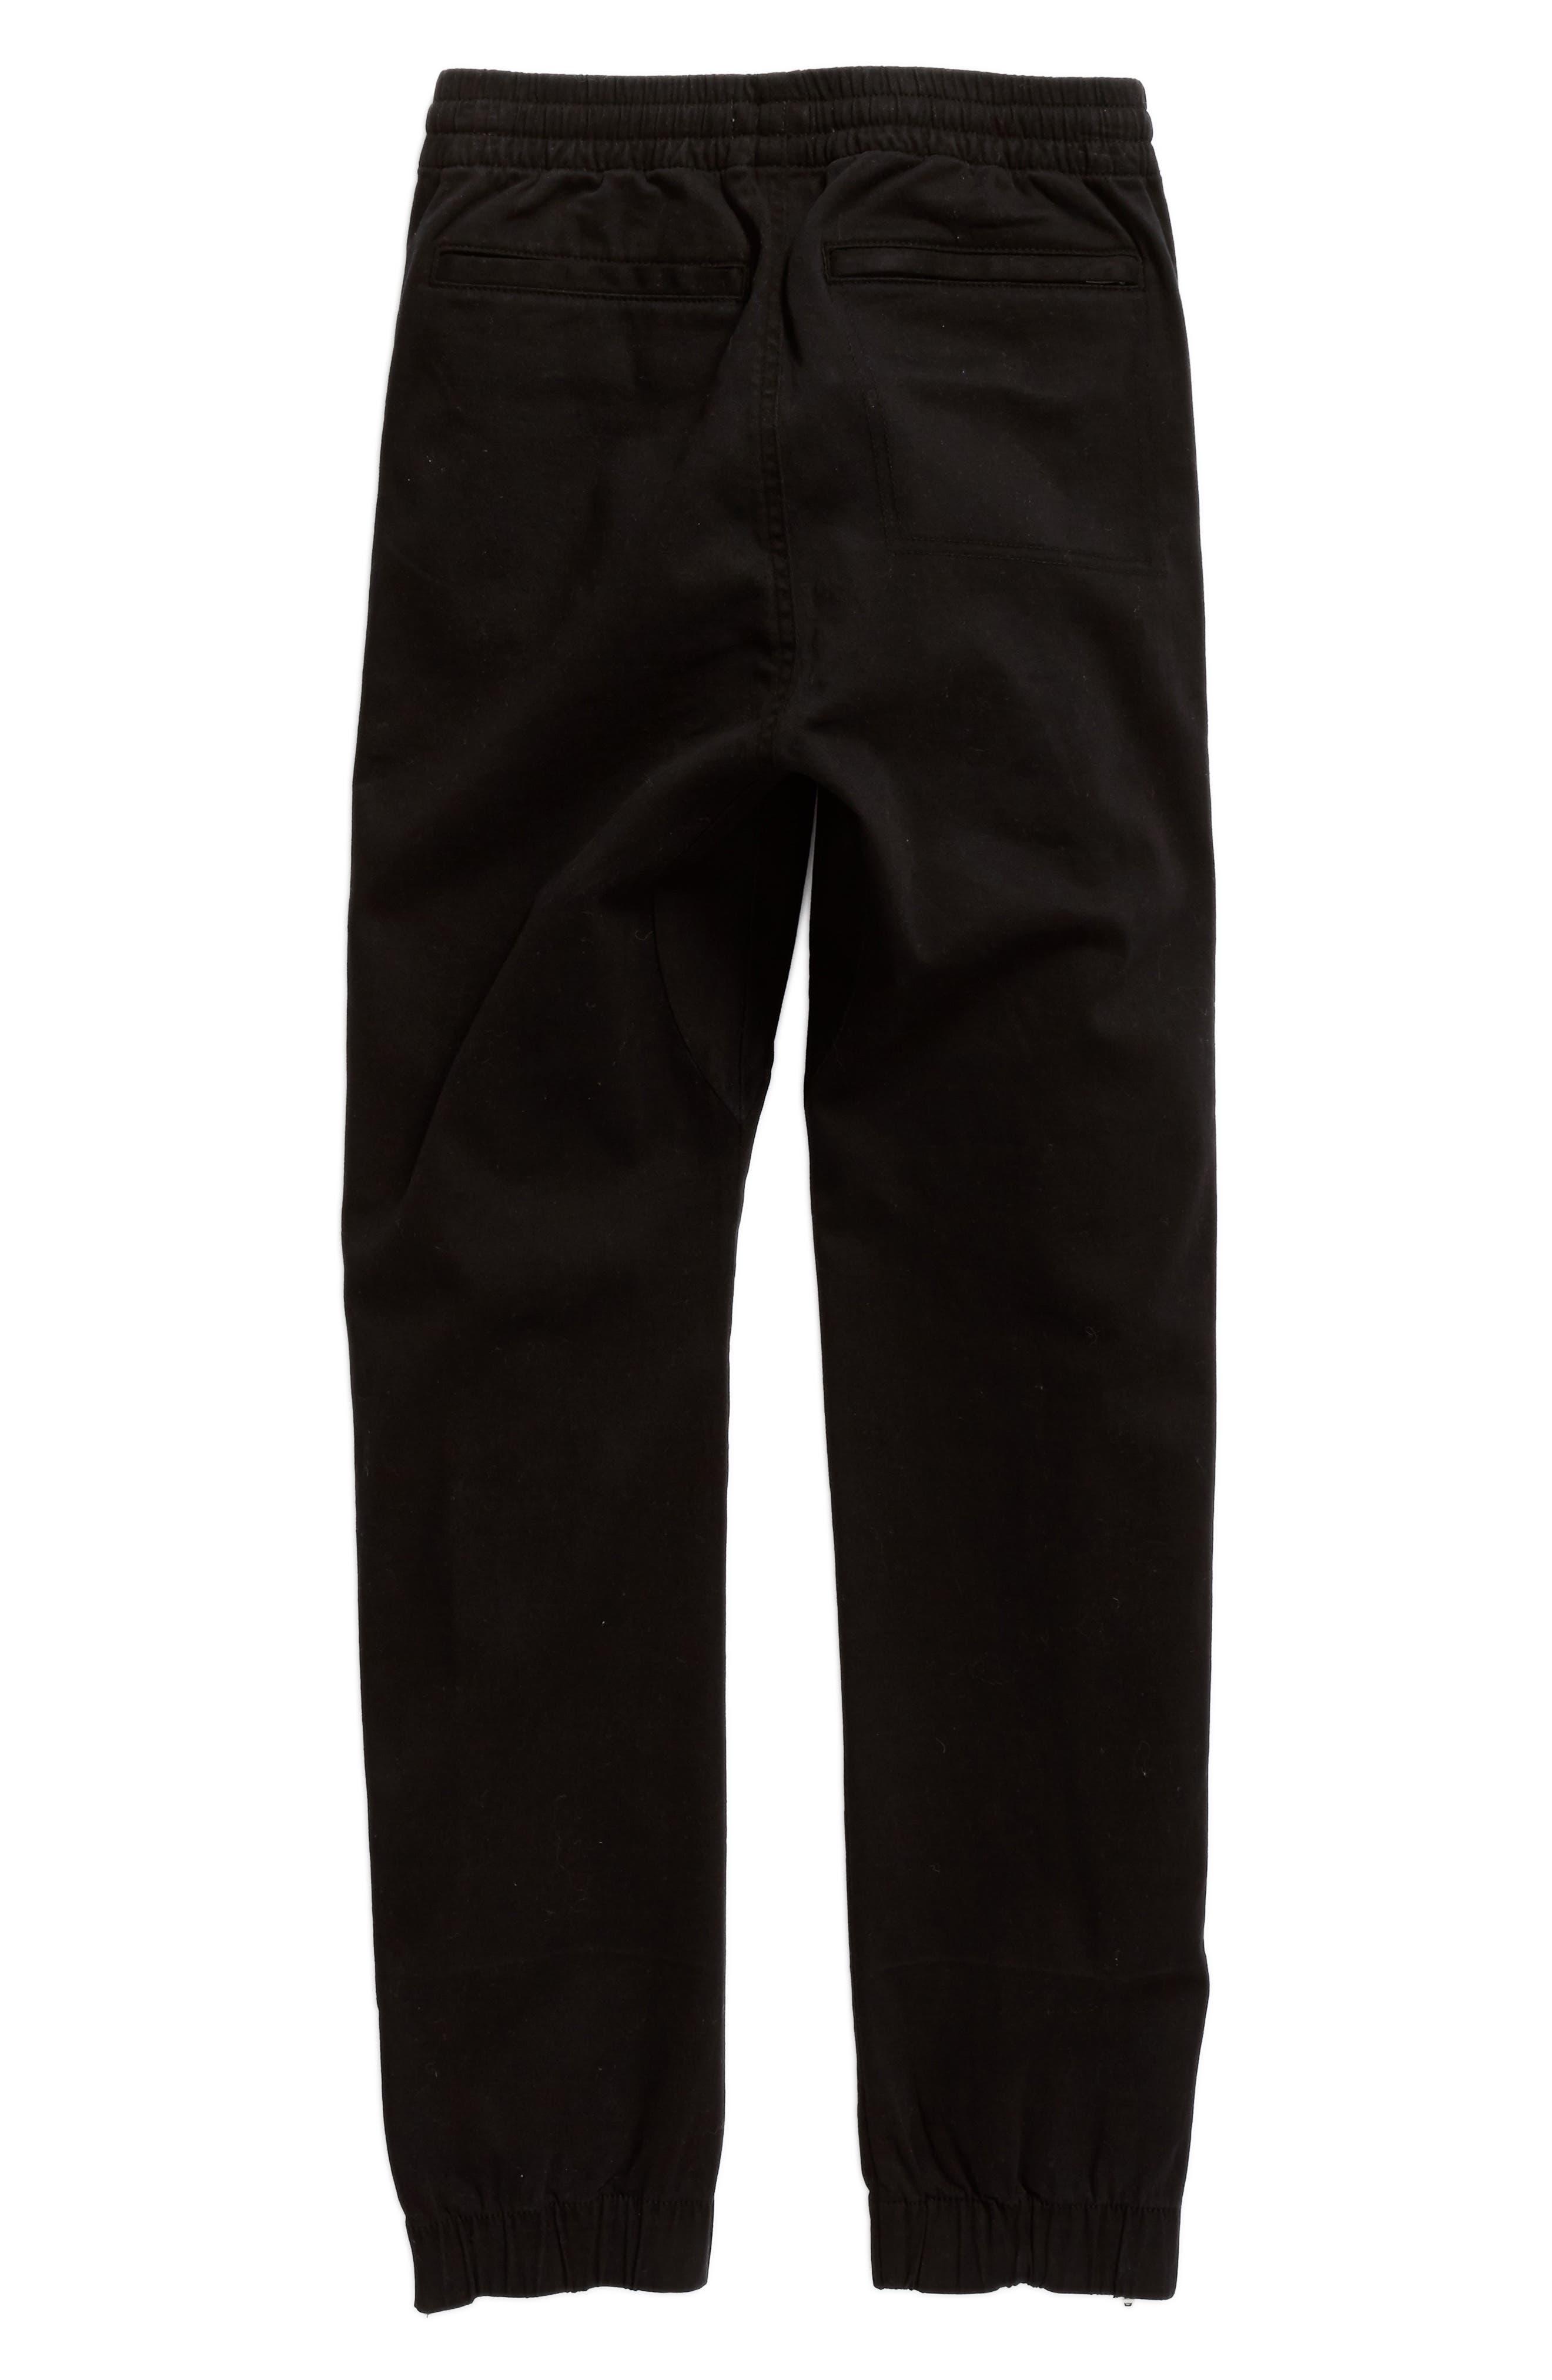 Washed Sweatpants,                             Alternate thumbnail 2, color,                             001